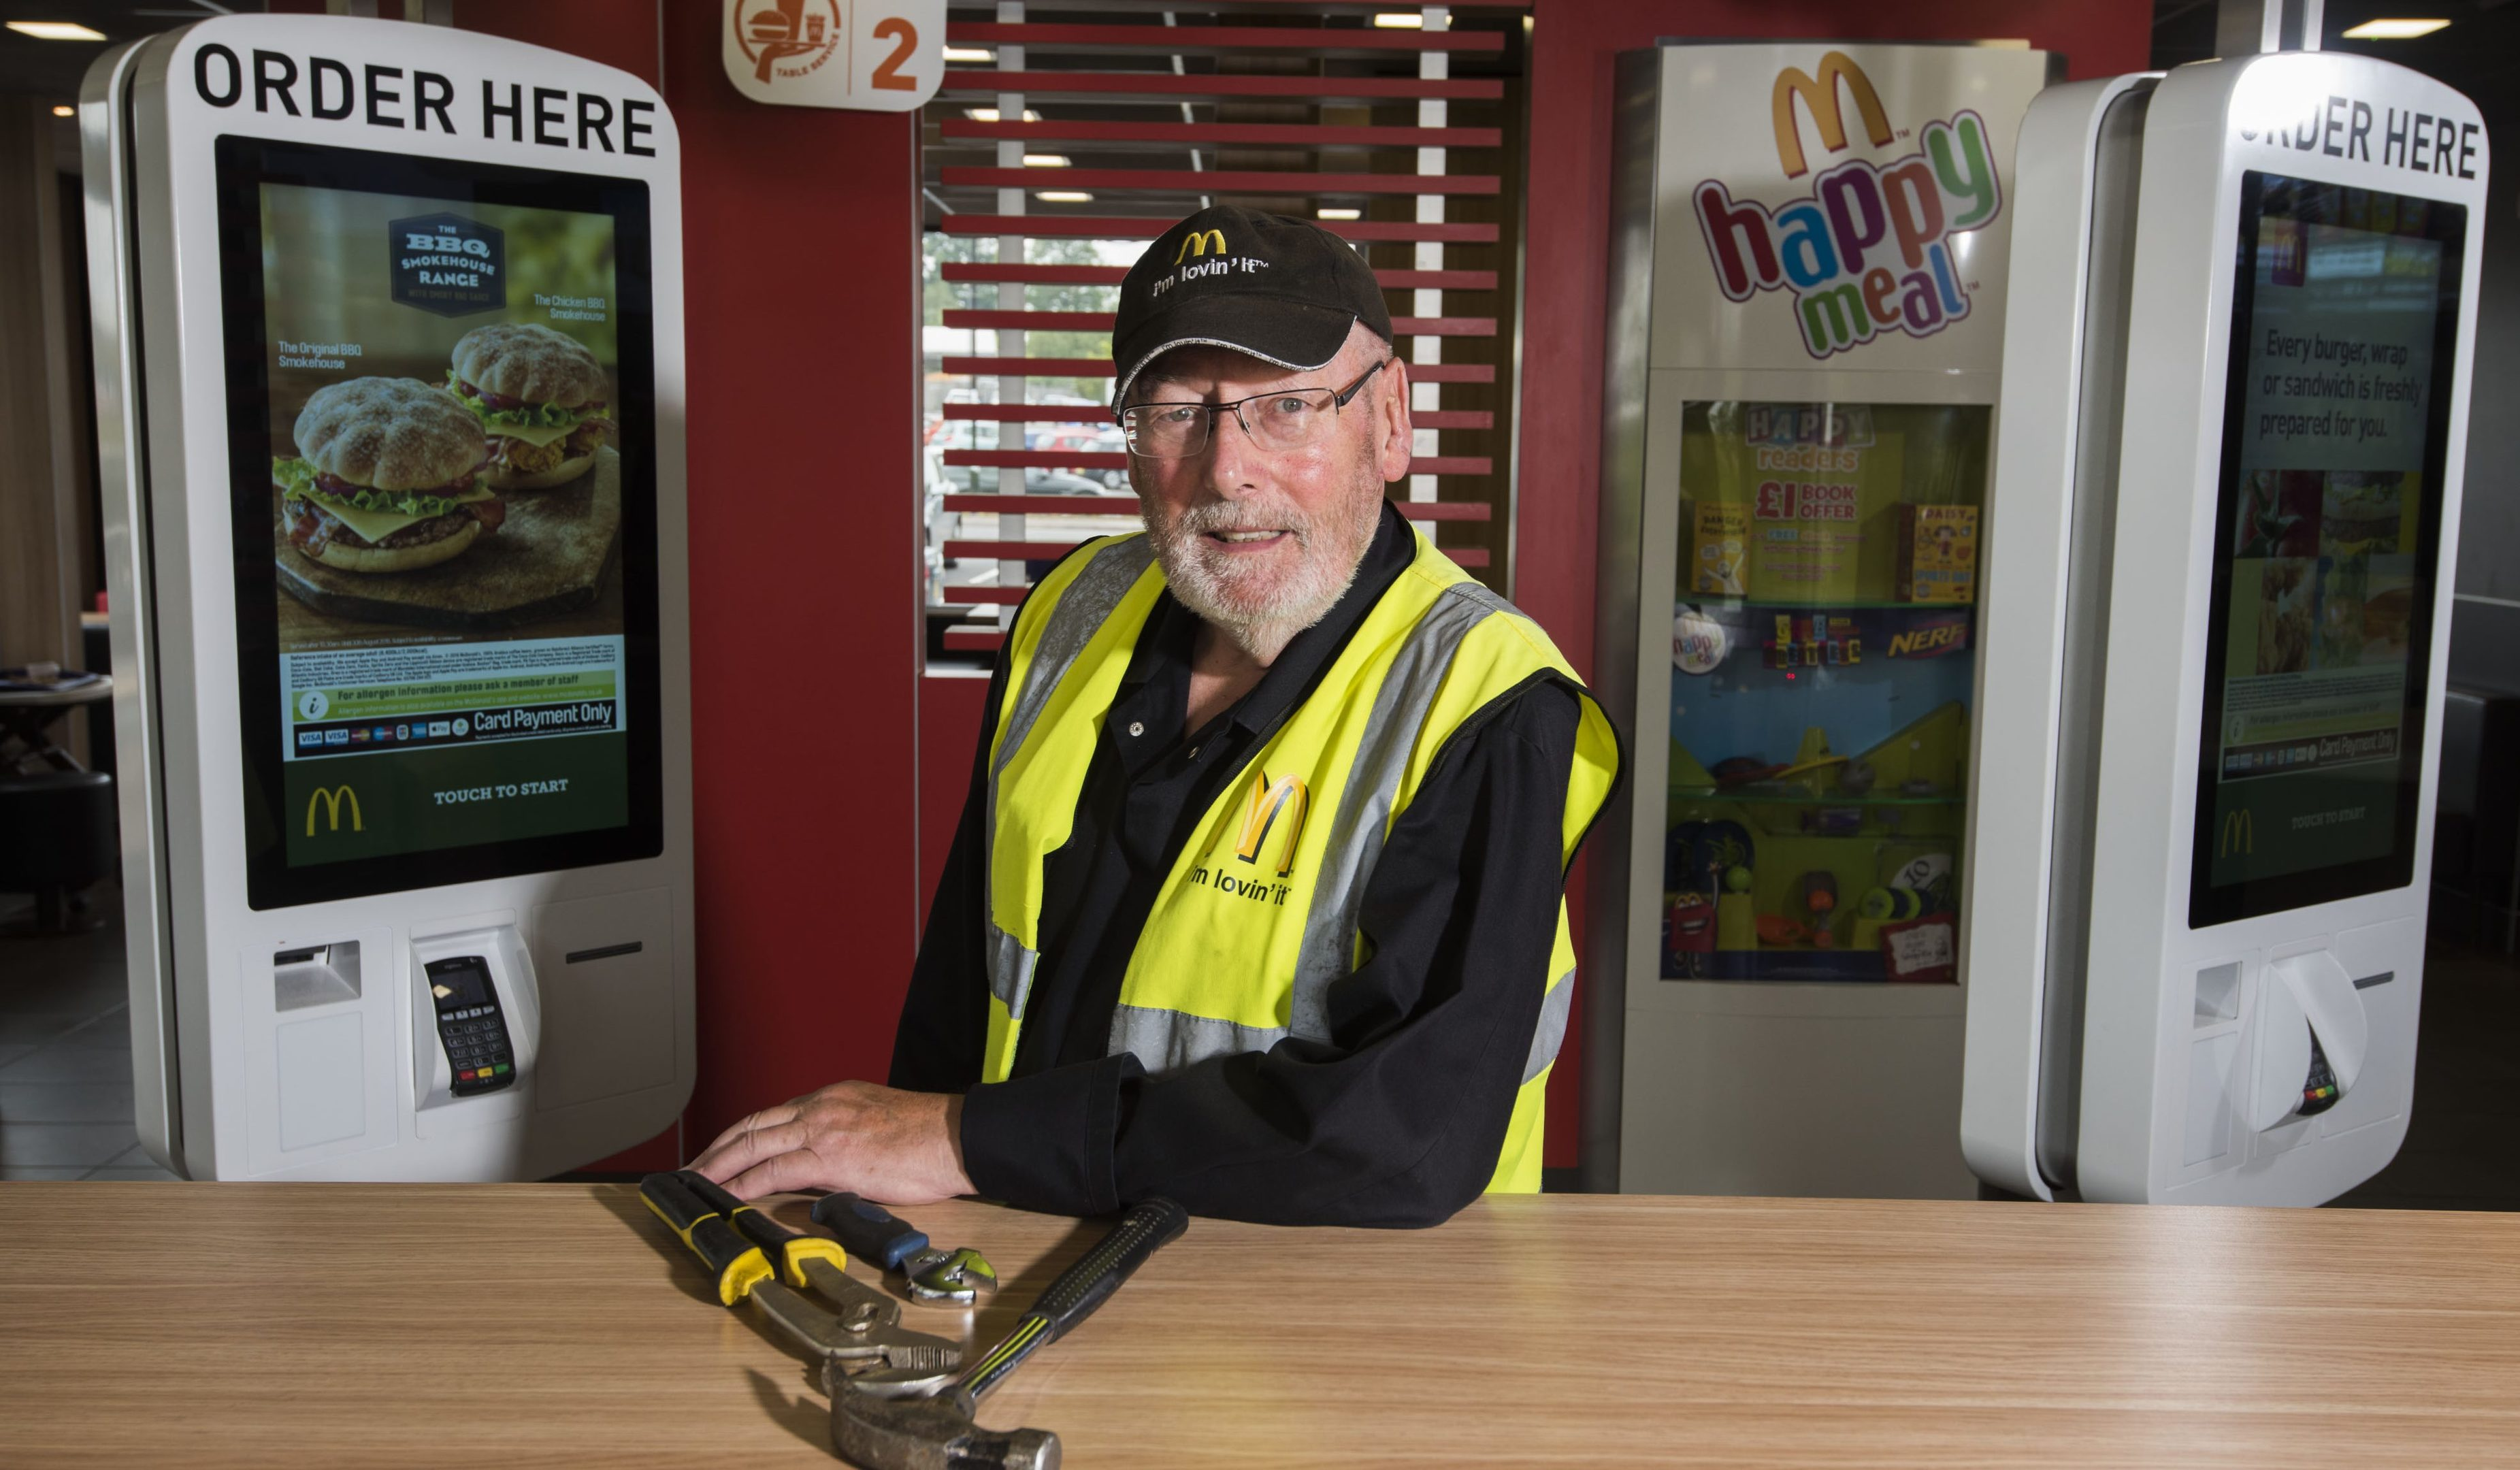 John Mabey is enjoying working even after retiring.